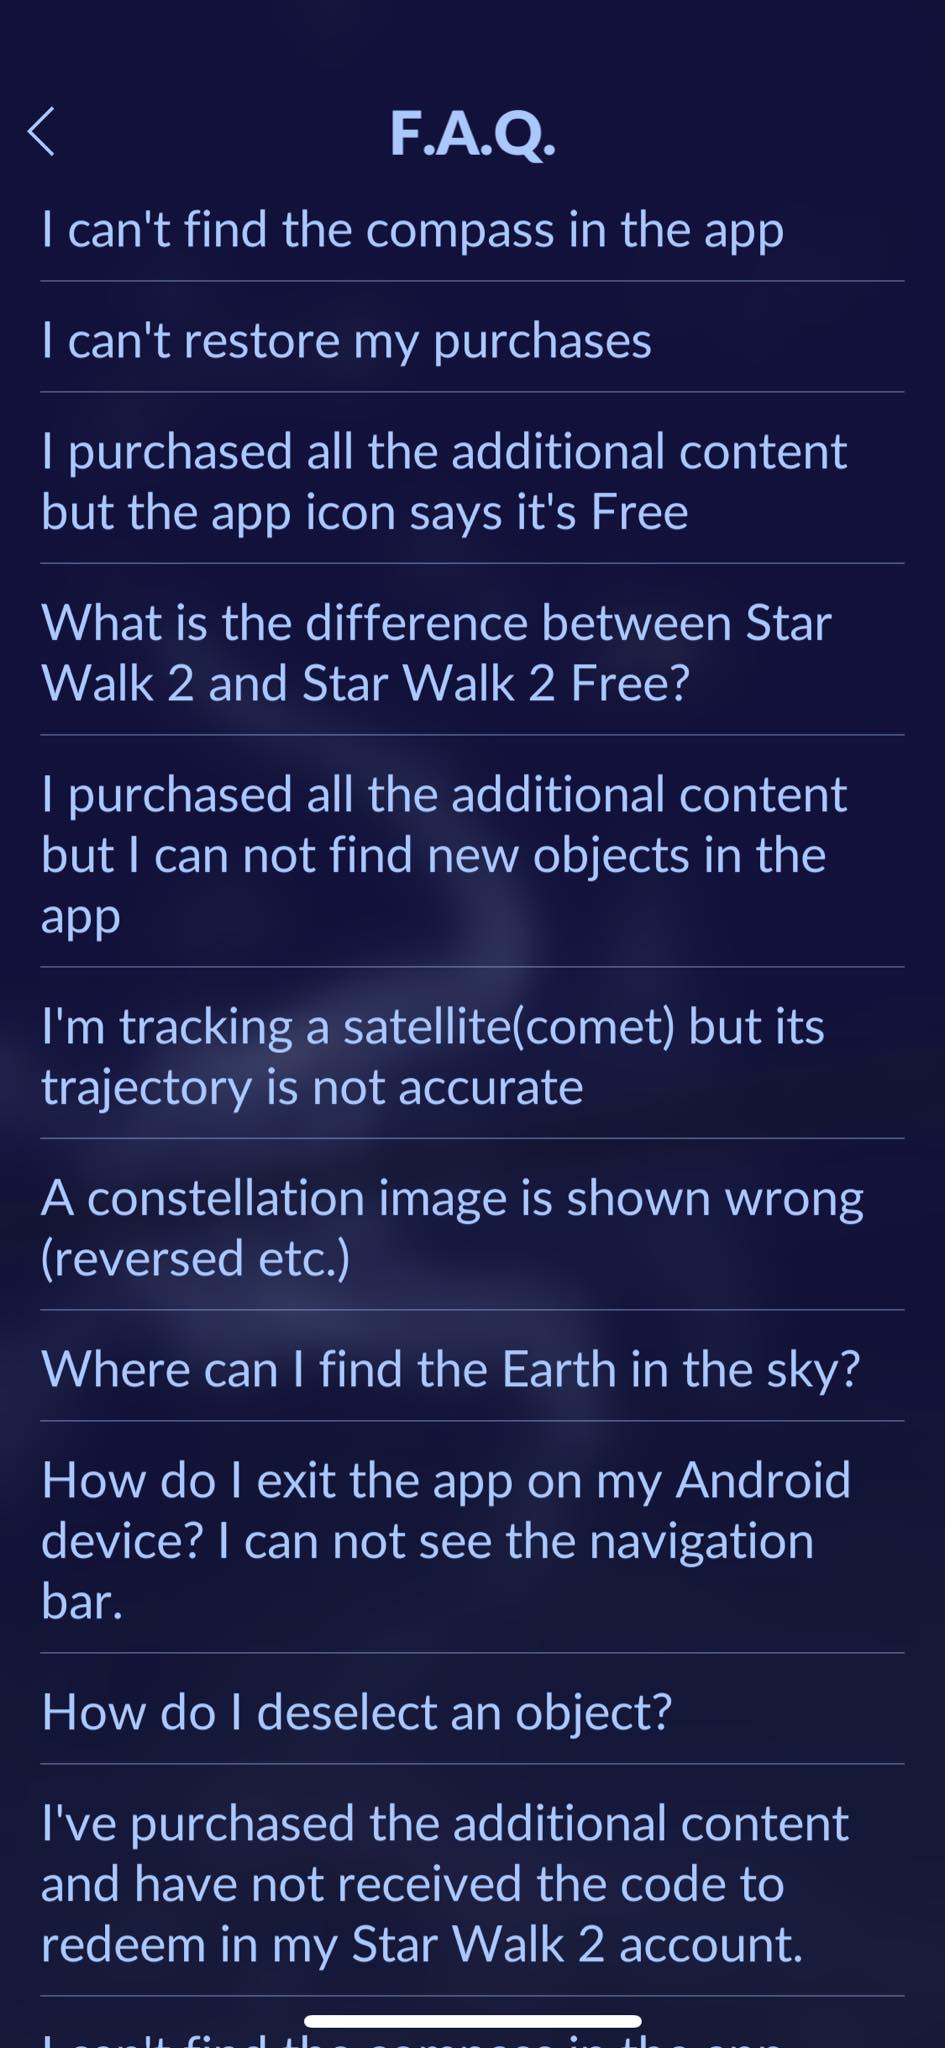 FAQ on iOS by Star Walk from UIGarage